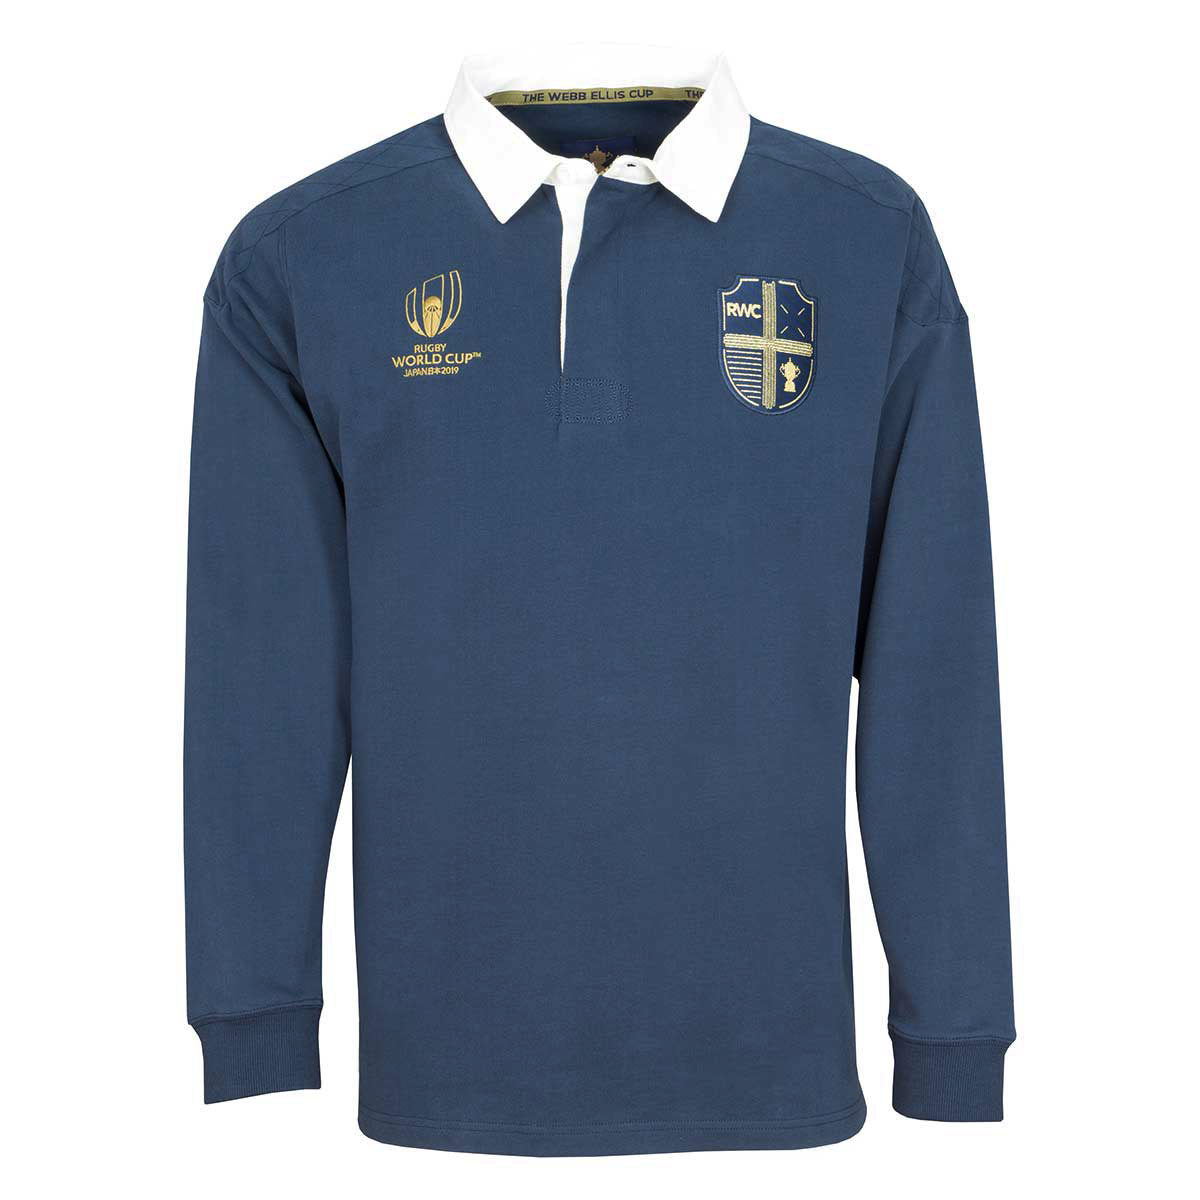 242d100b347591 ... Rugby World Cup 2019 Webb Ellis Plain Rugby Shirt L/S - Front ...